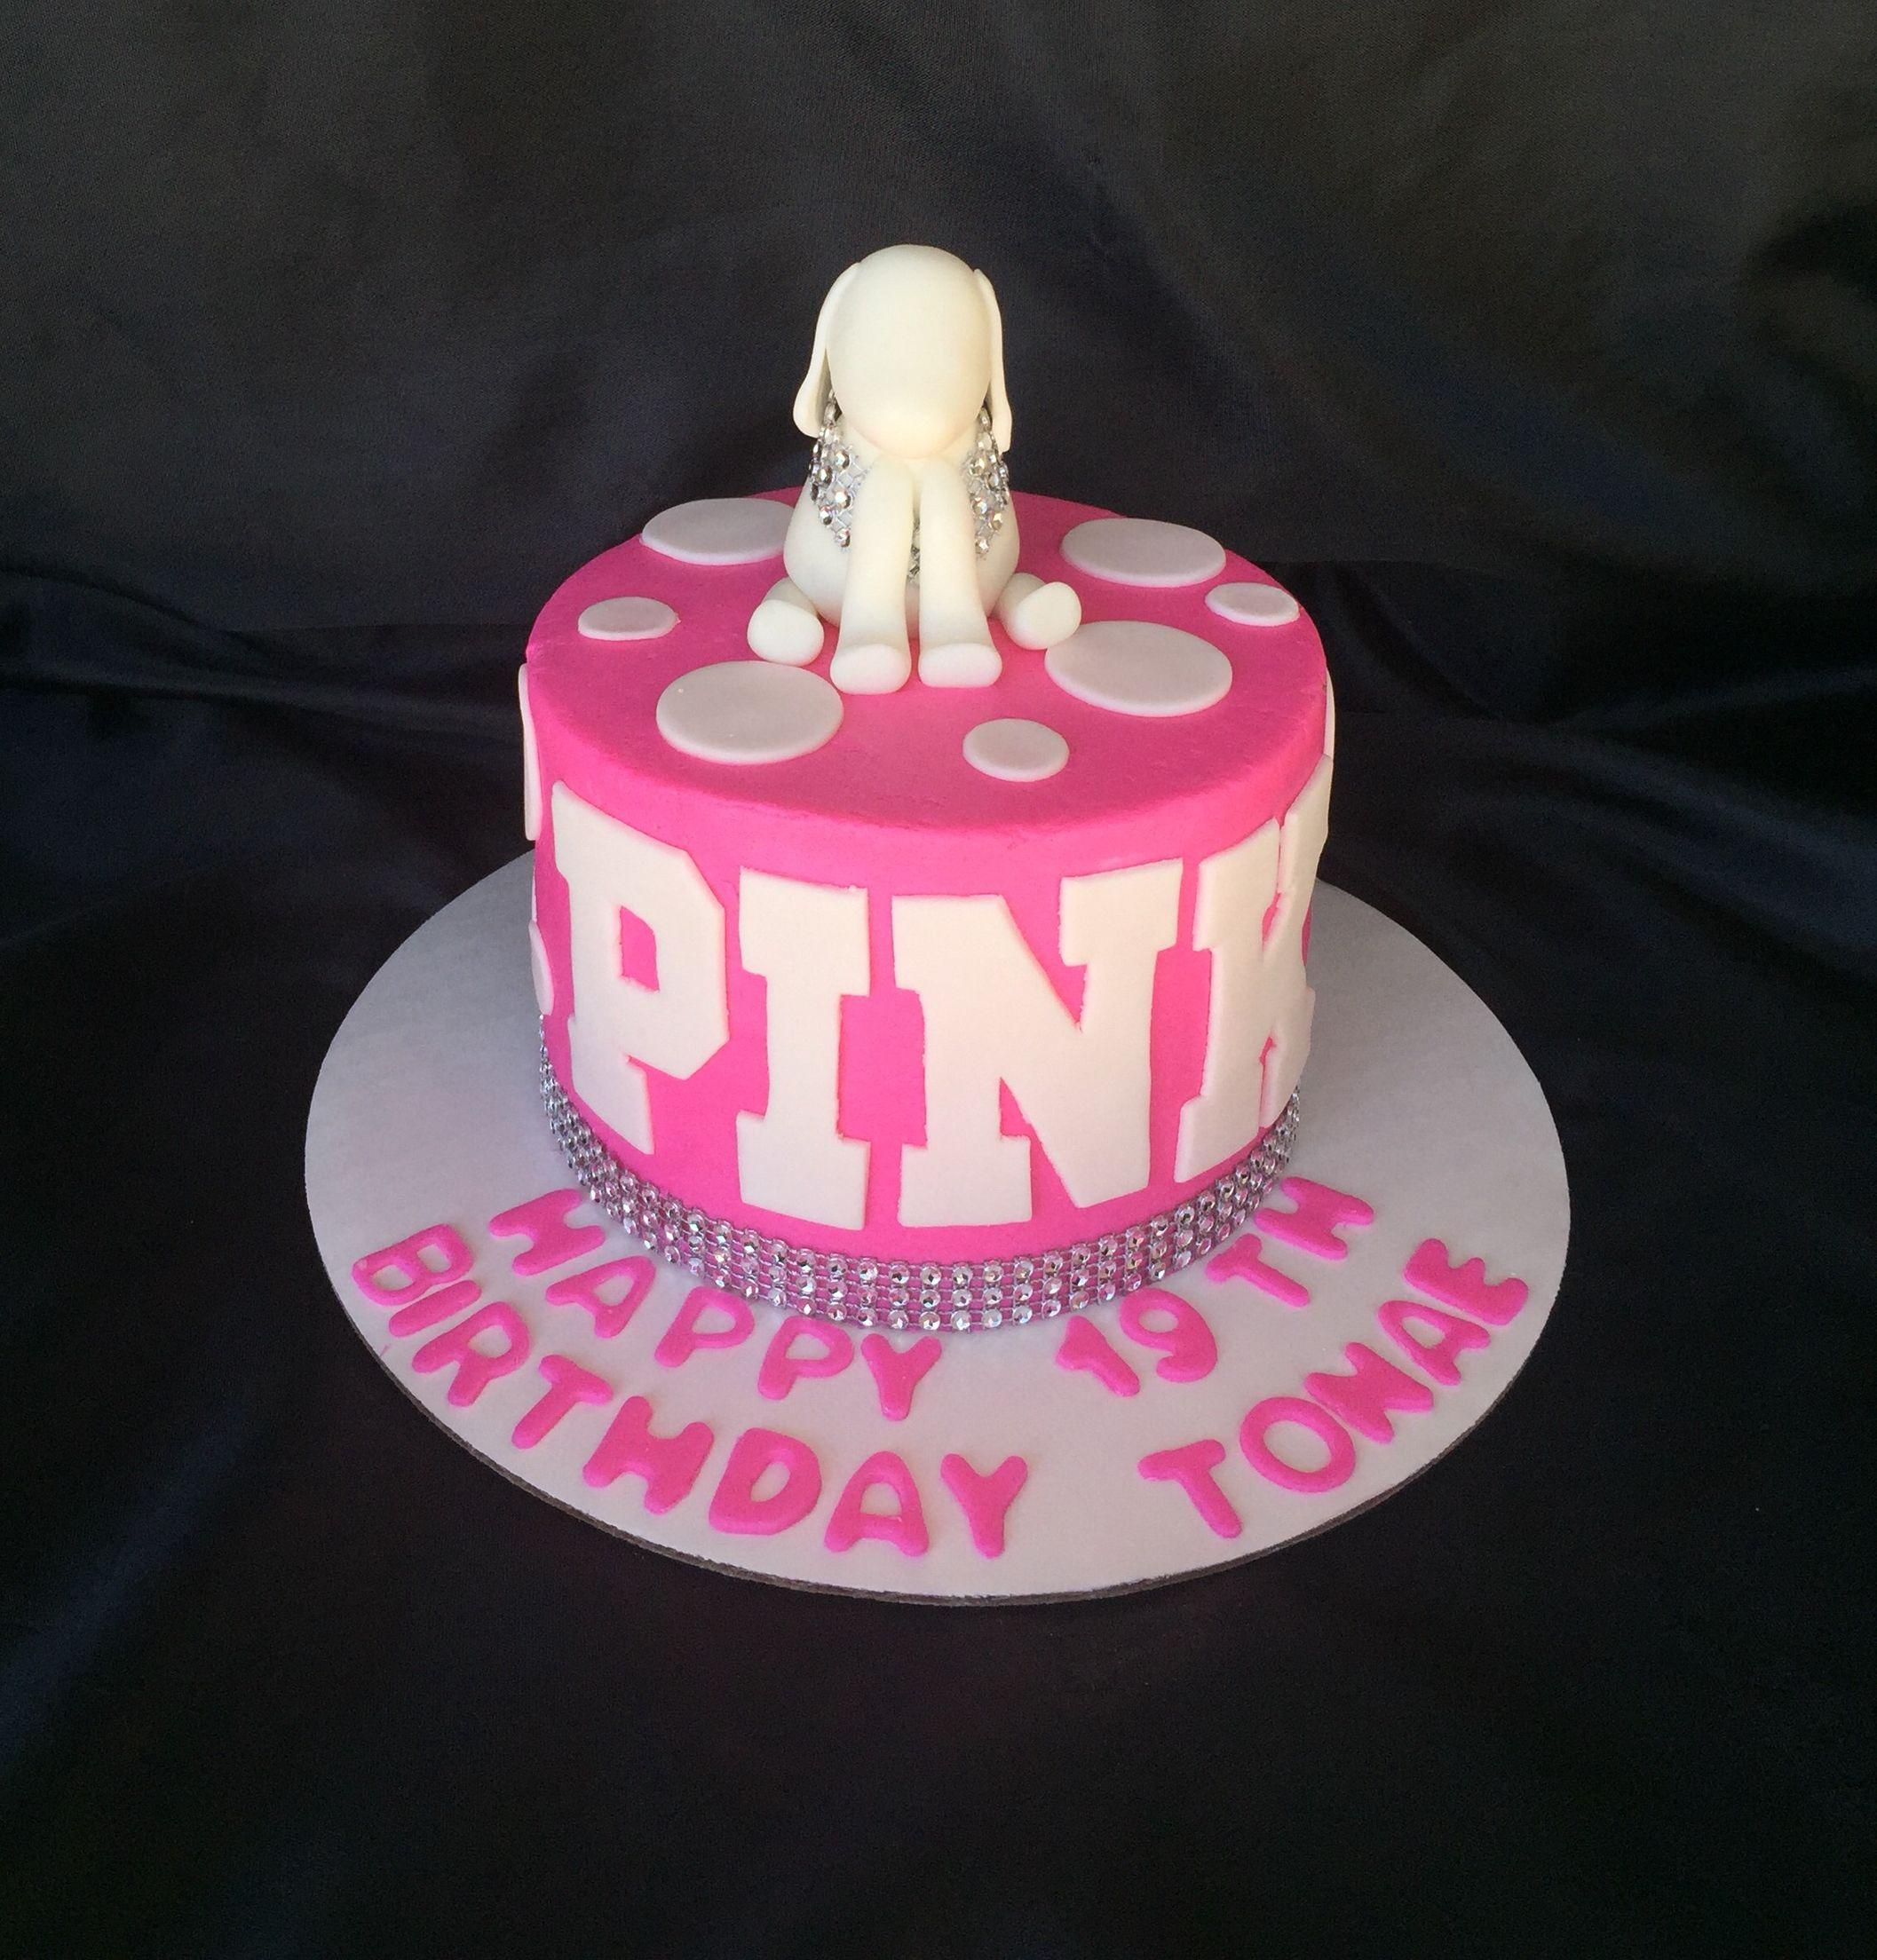 Victoria Secret Cake Victoria Secret Cake 13 Birthday Cake 13th Birthday Cake For Girls